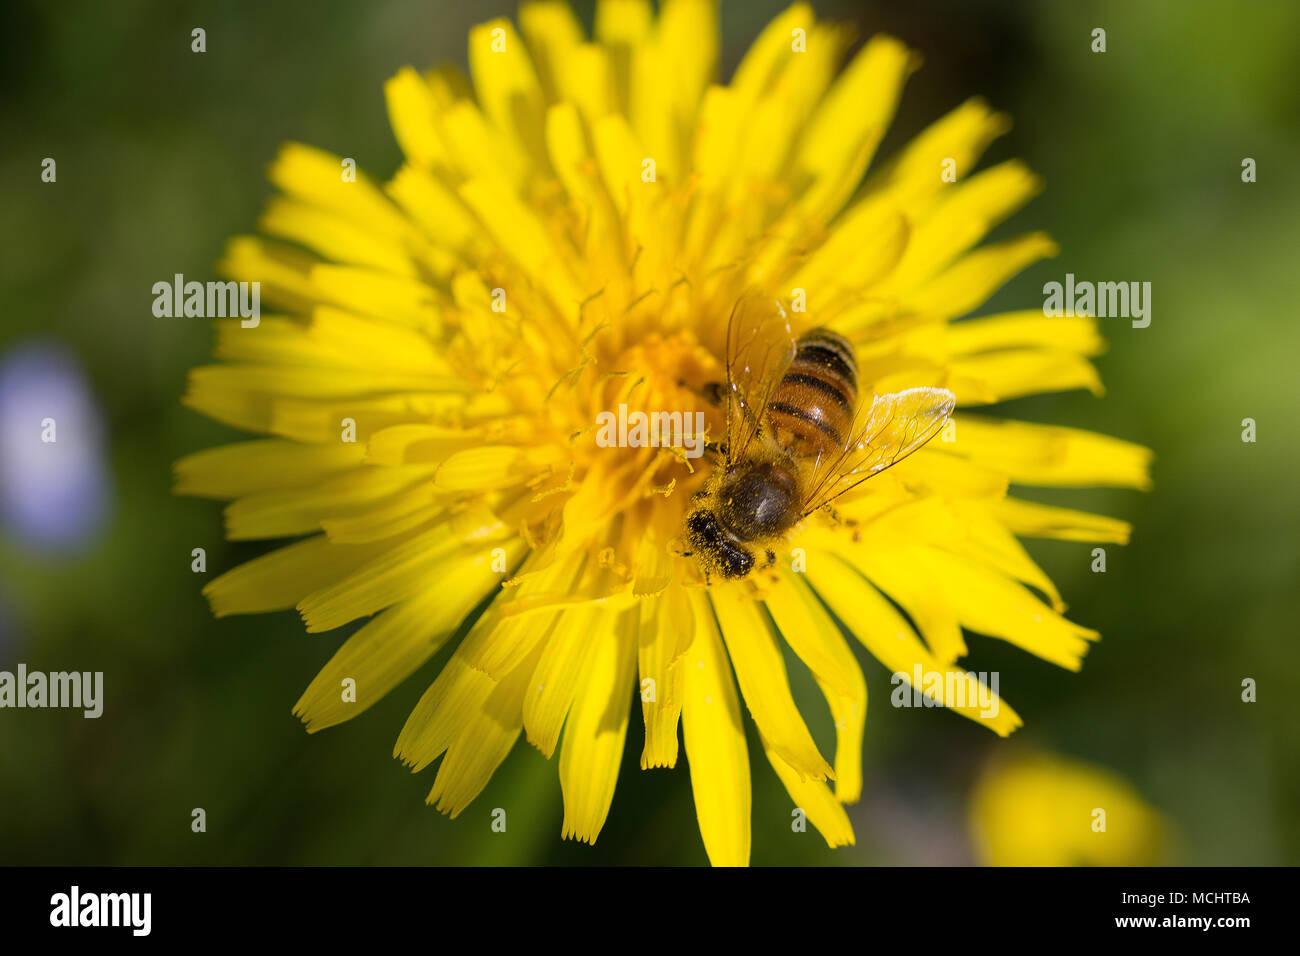 yellow dandelion closeup with bee Stock Photo